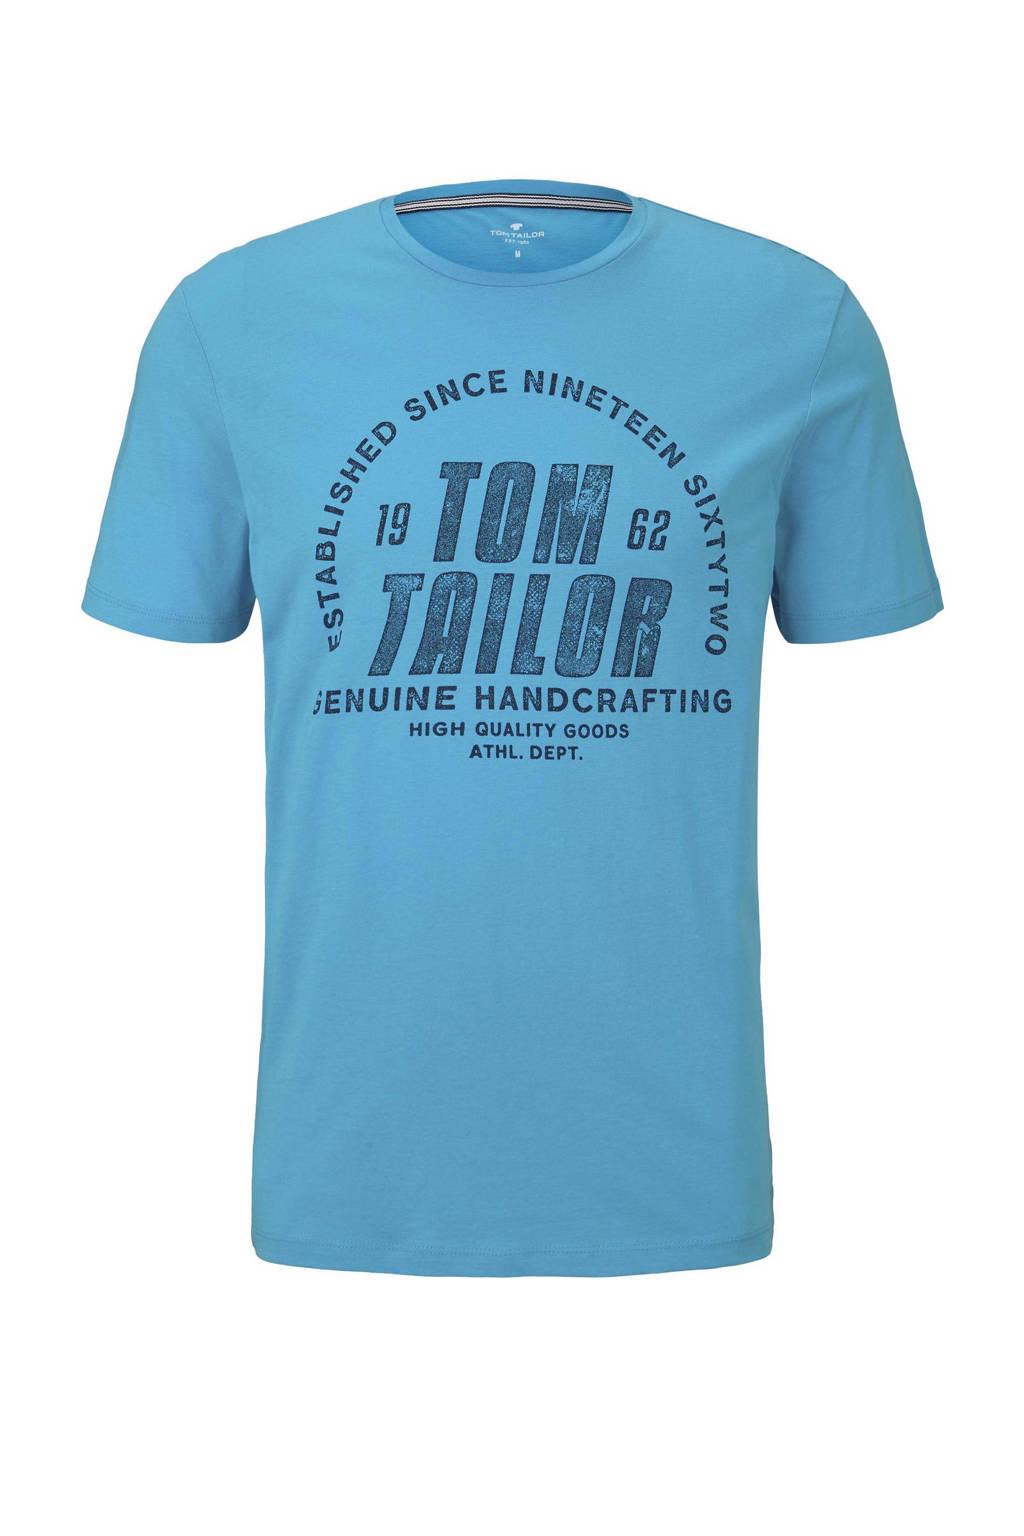 Tom Tailor T-shirt met logo blauw, Blauw